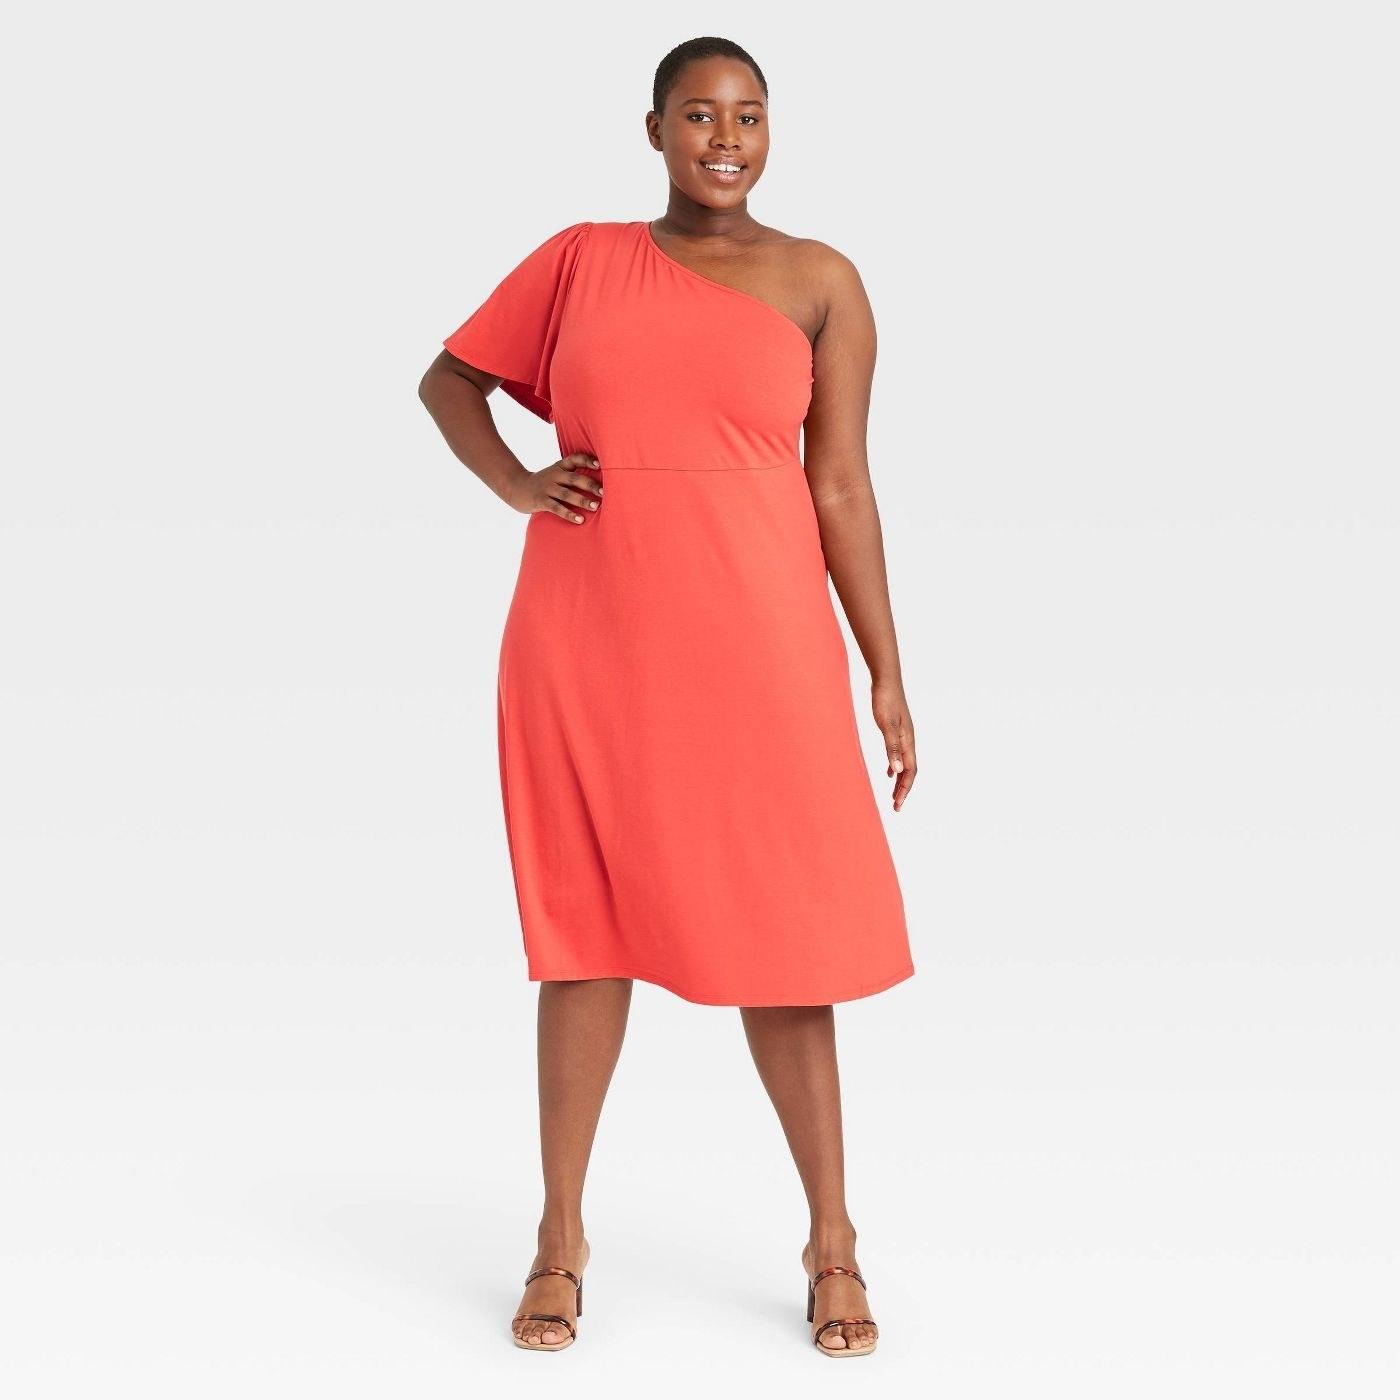 Model wearing orange dress that goes past the knee